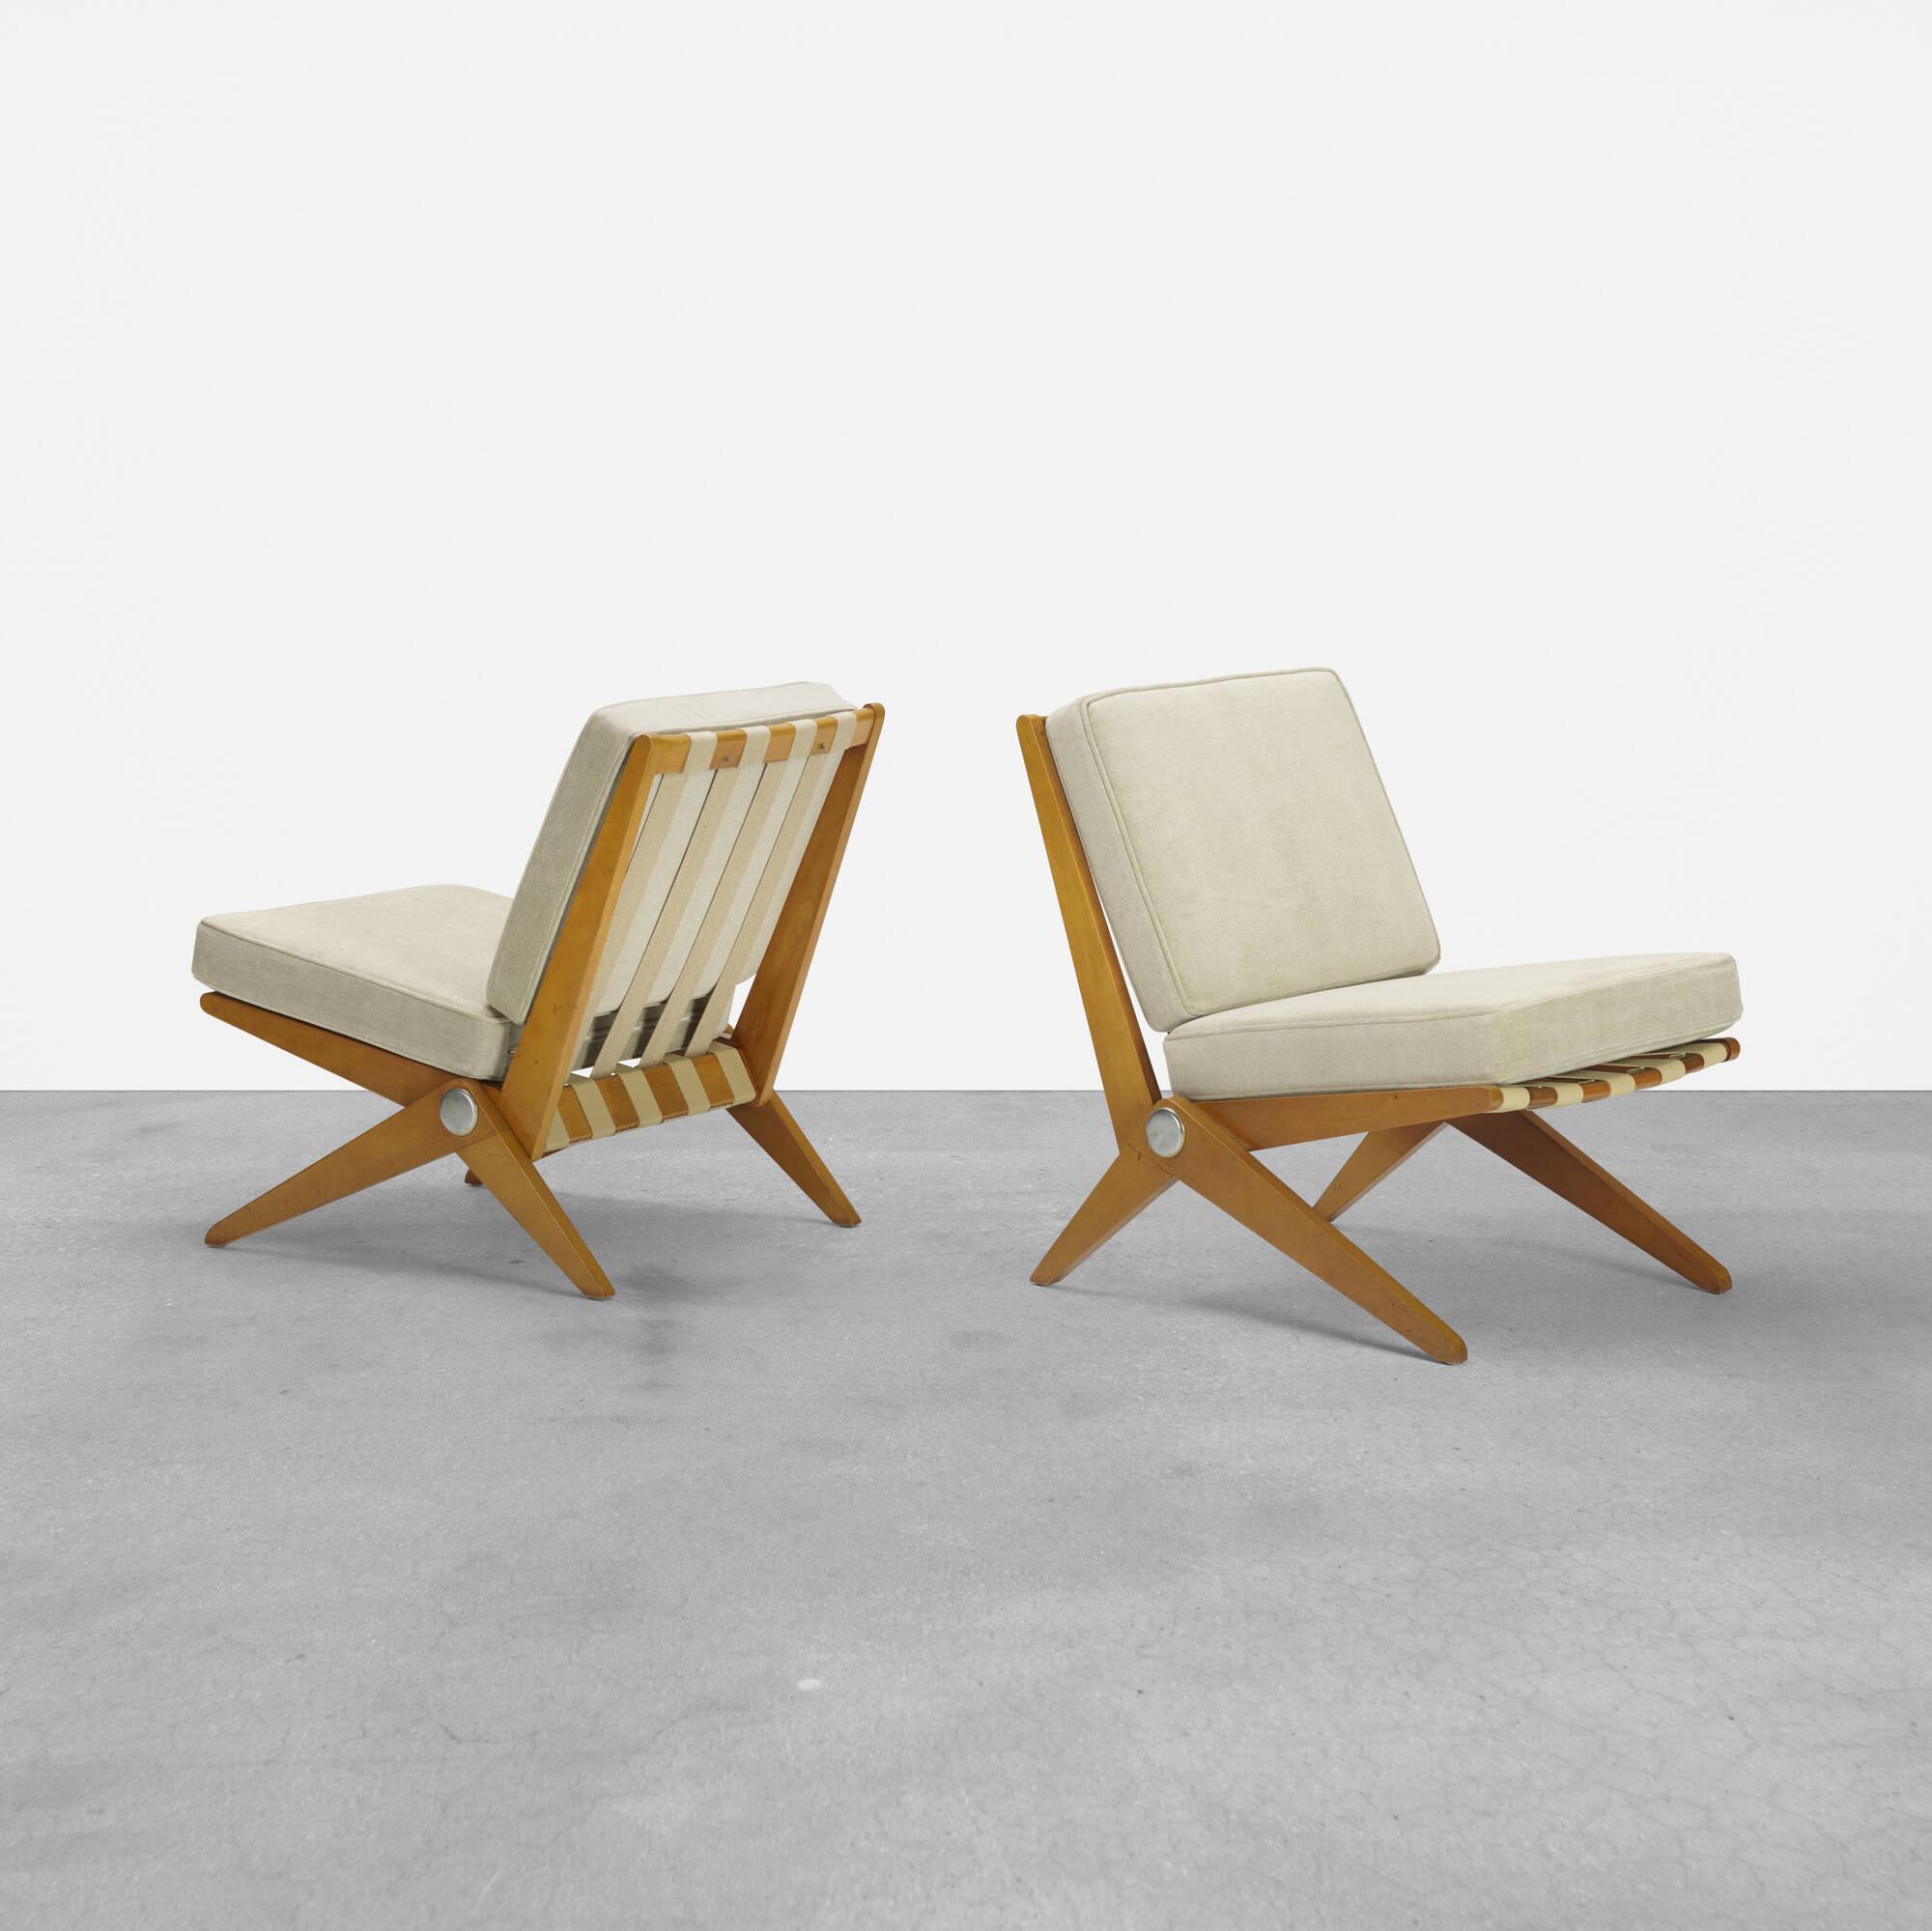 121: Pierre Jeanneret / Scissor chairs, pair (1 of 2)